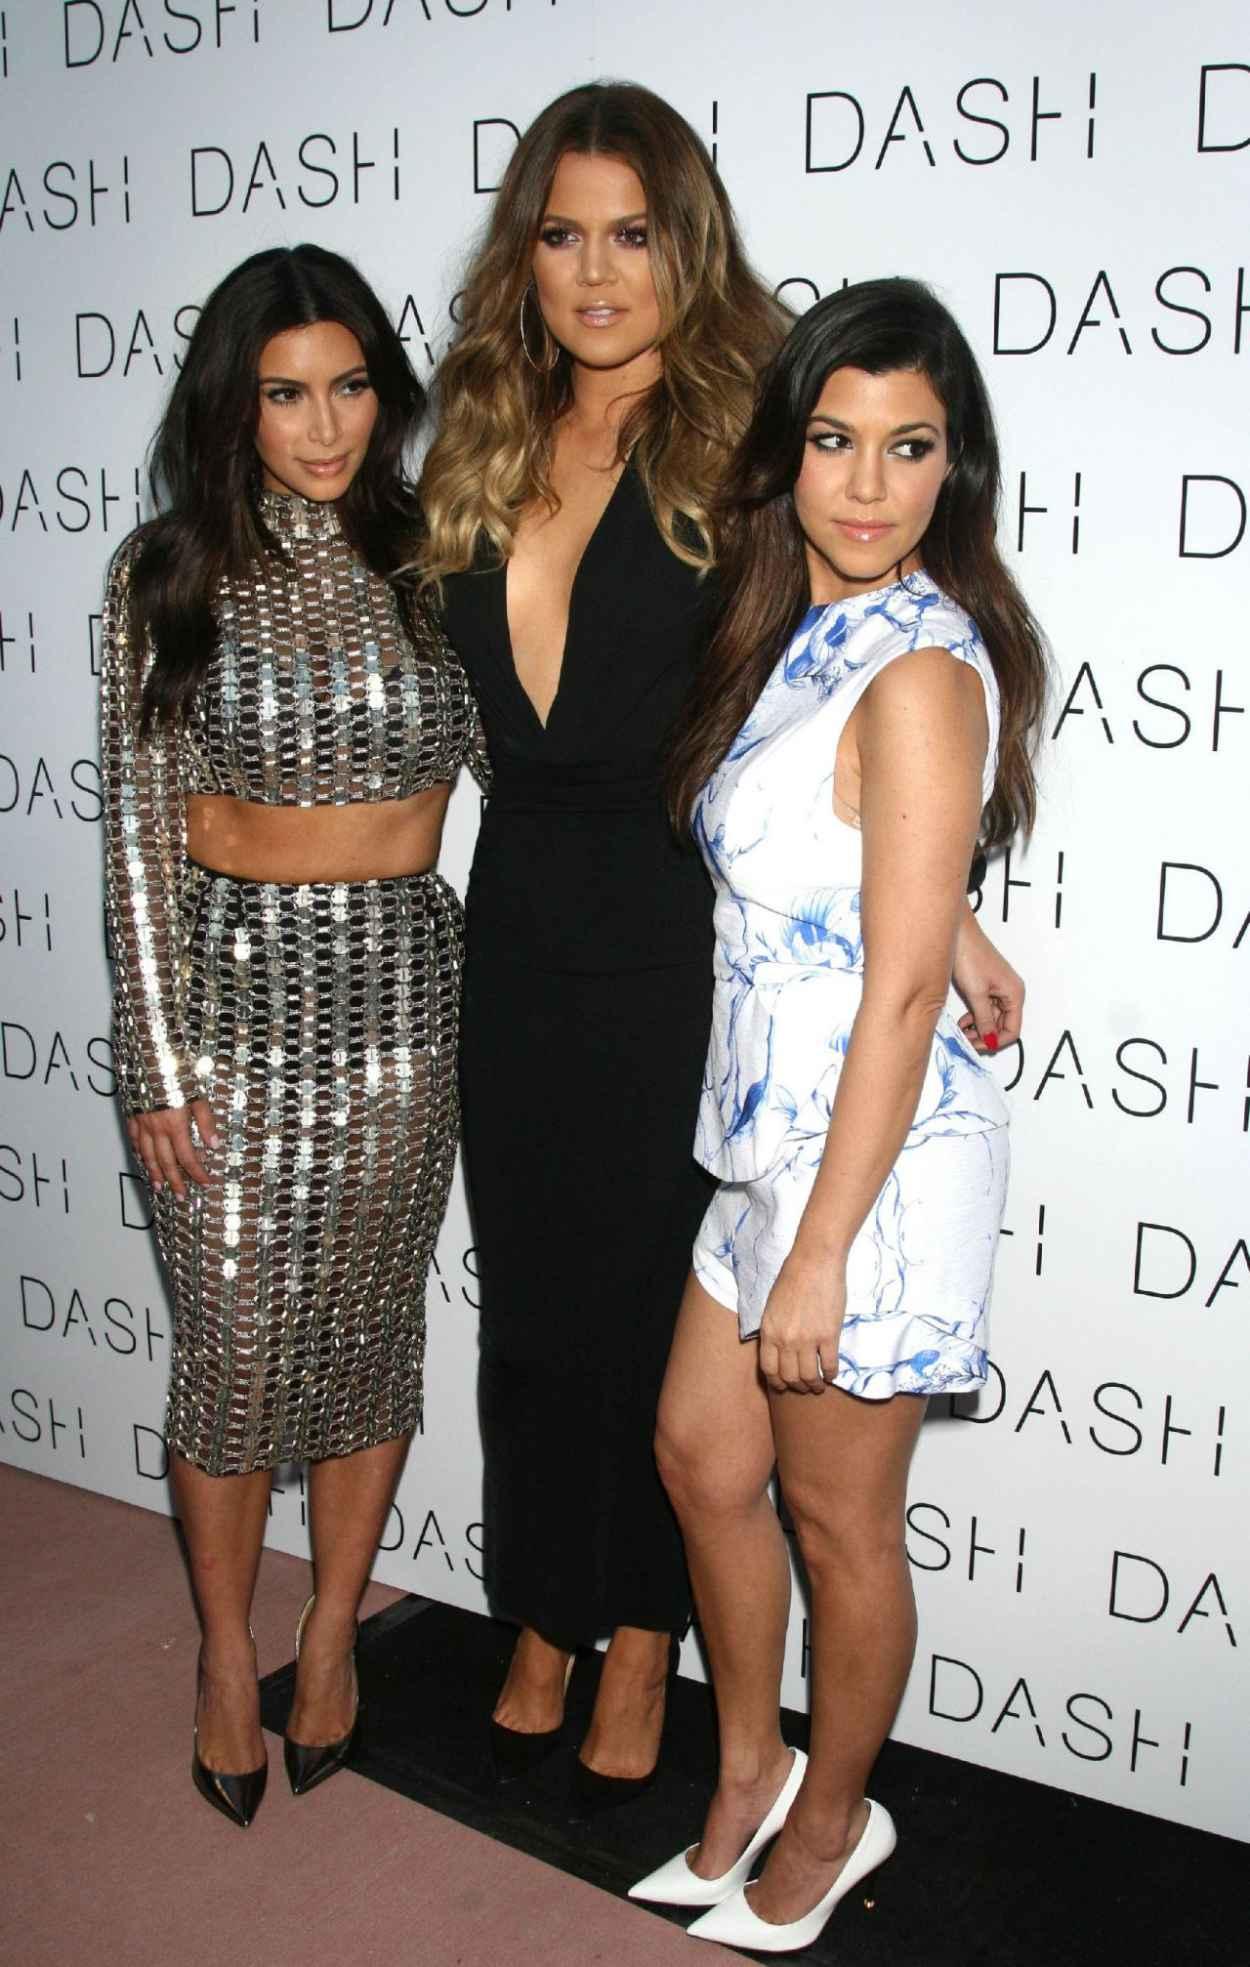 Kim, Khloe, & Kourtney Kardashian - Grand Opening of DASH in Miami Beach - March 2015-1